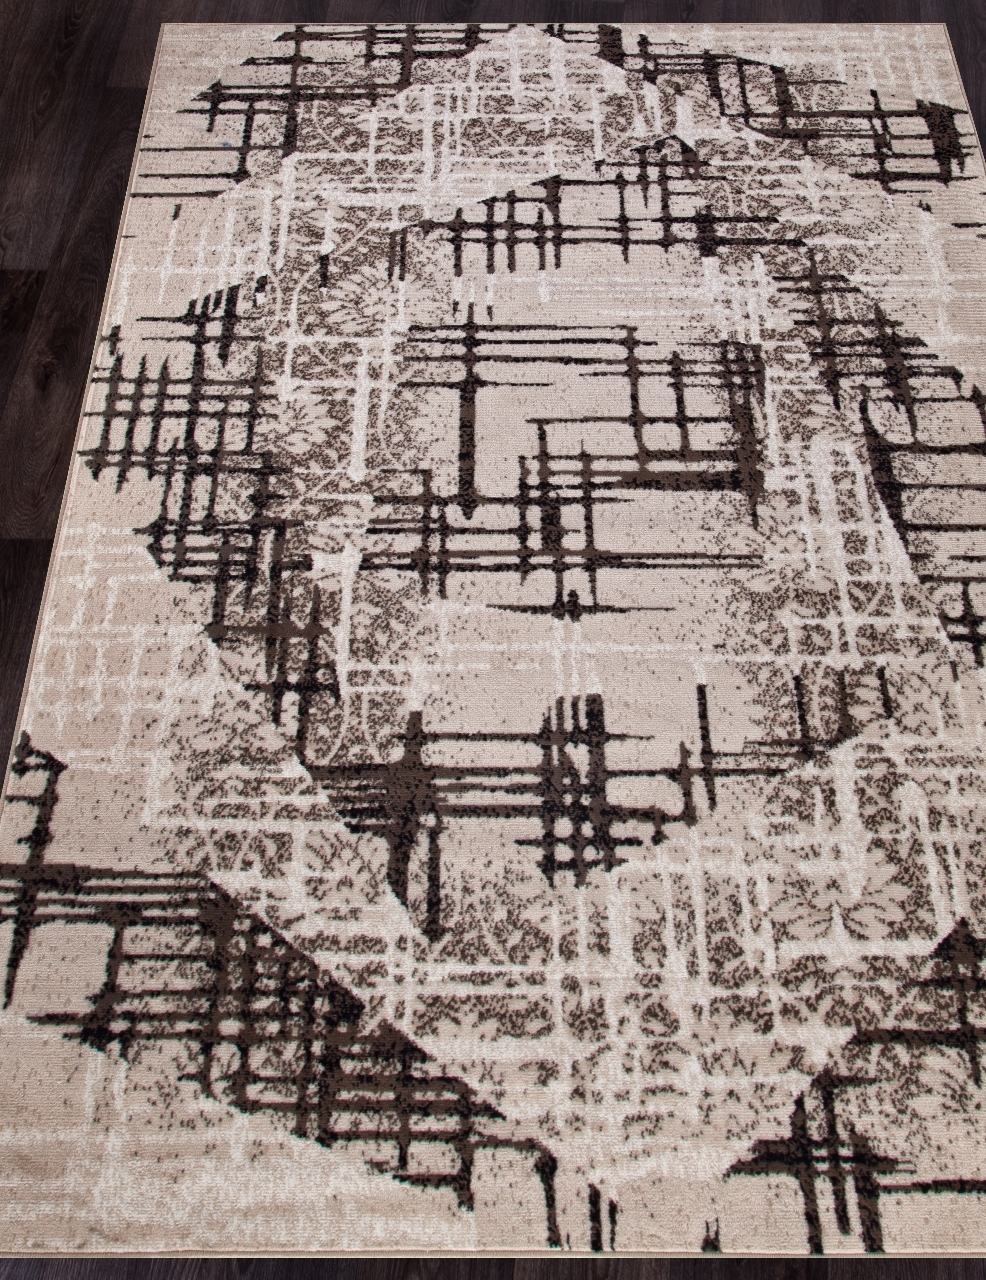 Ковер D708 - BEIGE-BROWN - Прямоугольник - коллекция SIERRA - фото 1